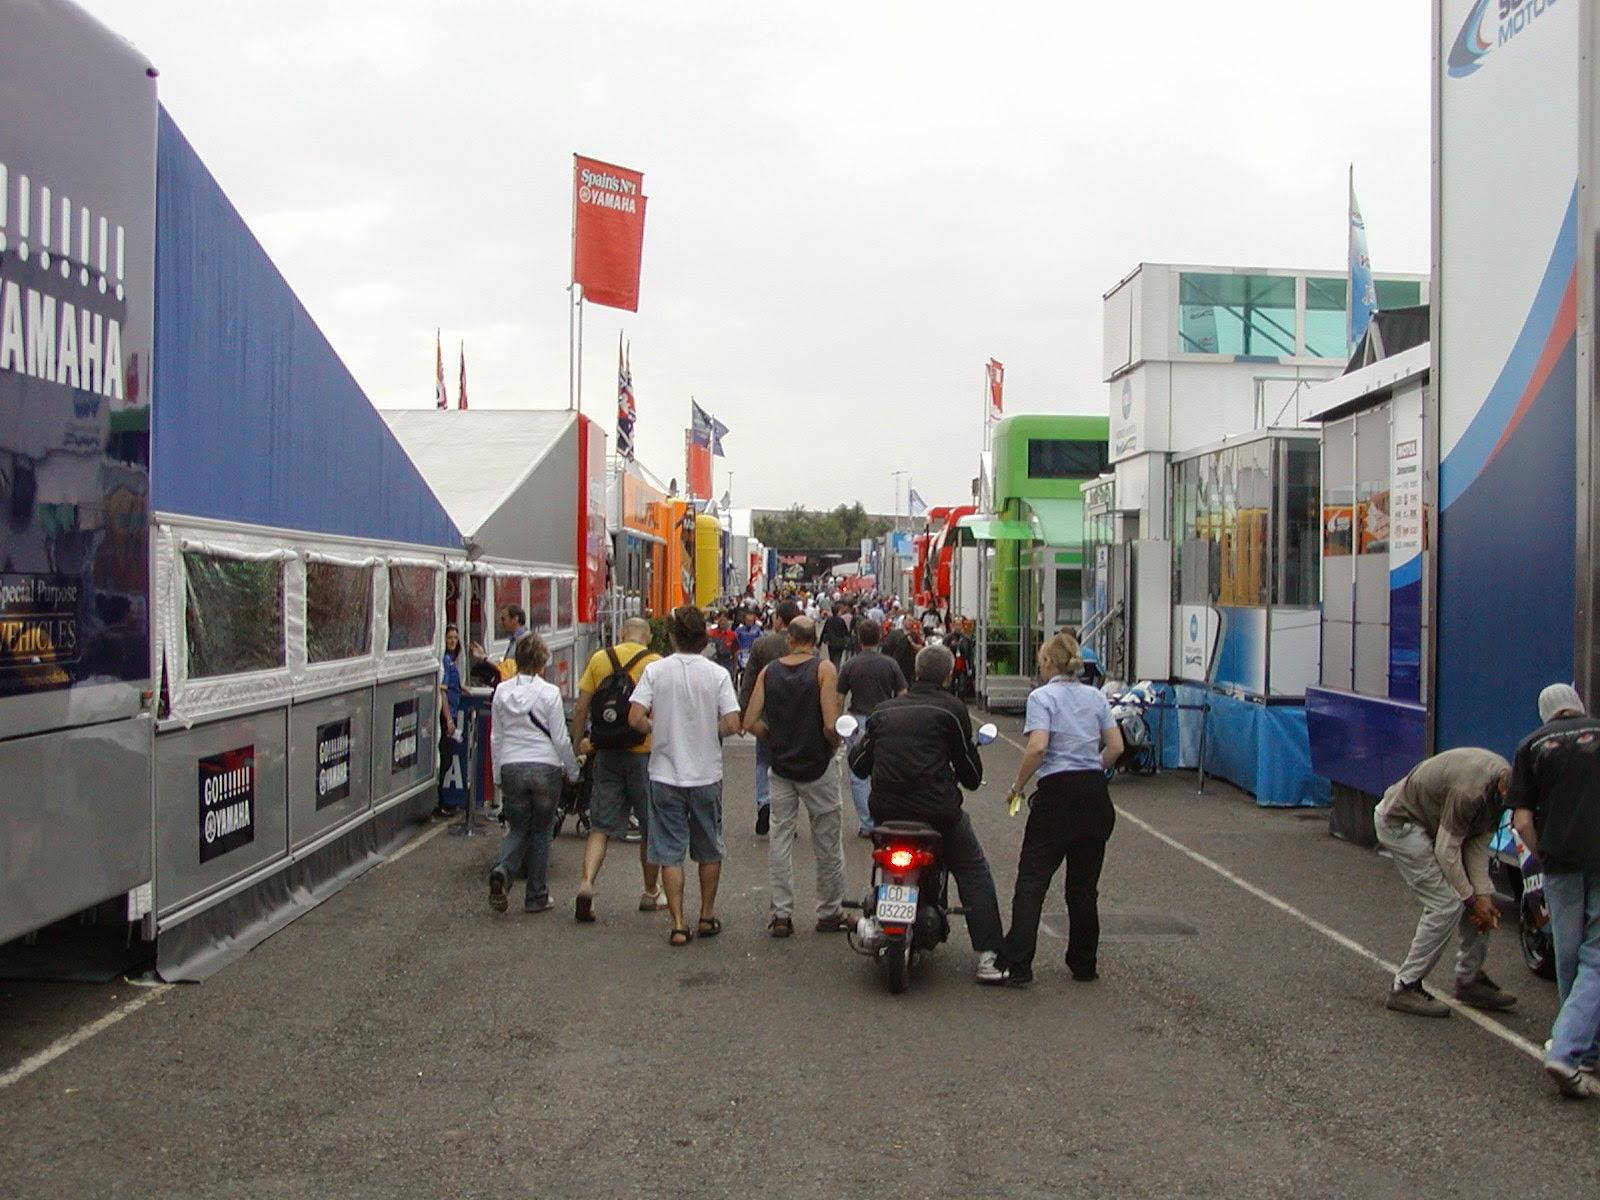 Paddcok del circuito de Donington Park